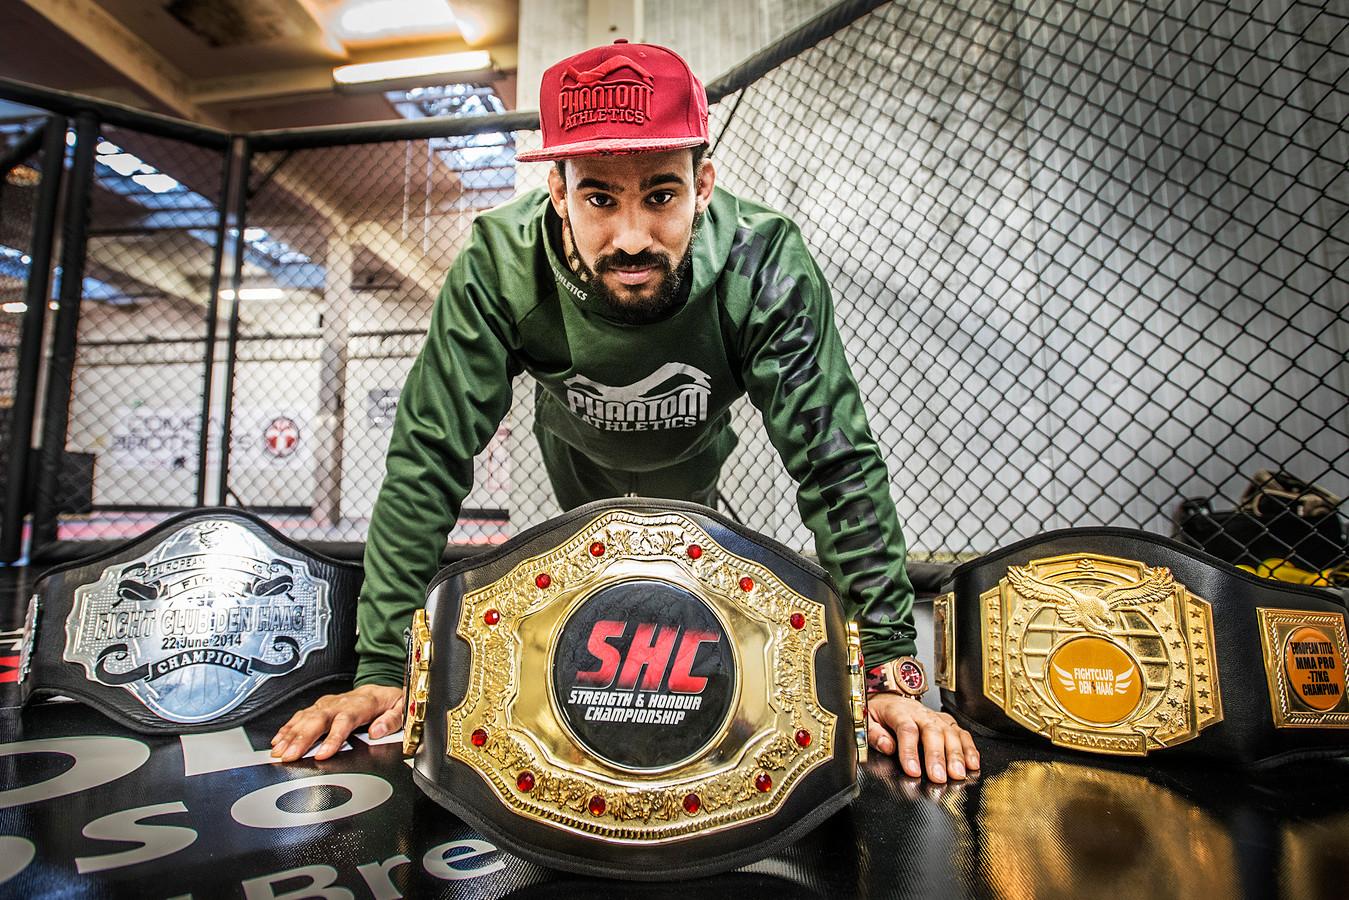 MMA-vechter Pieter Buist.